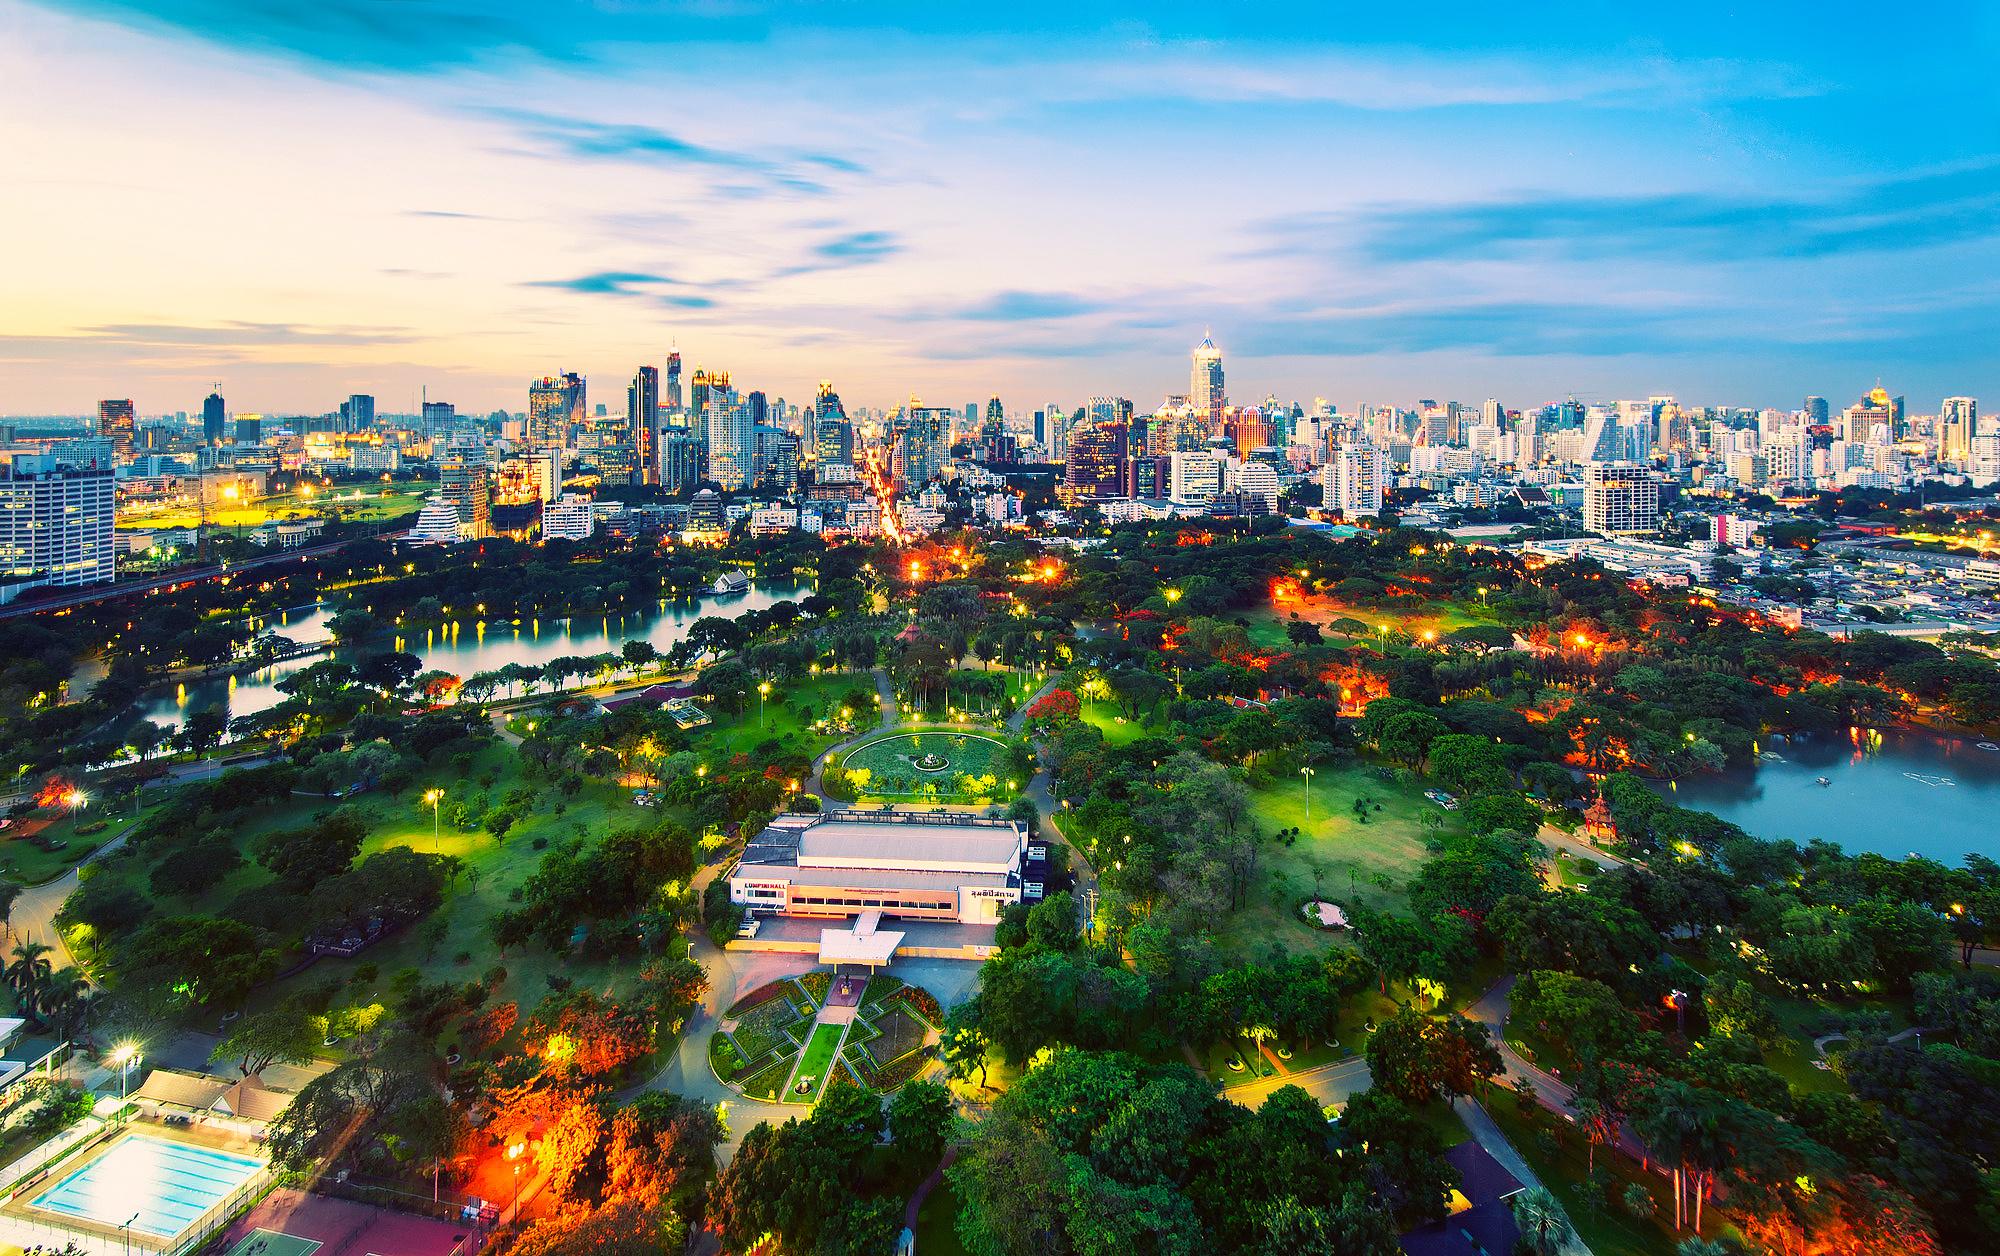 страны архитектура Бангкок Таиланд ночь  № 2195108 загрузить